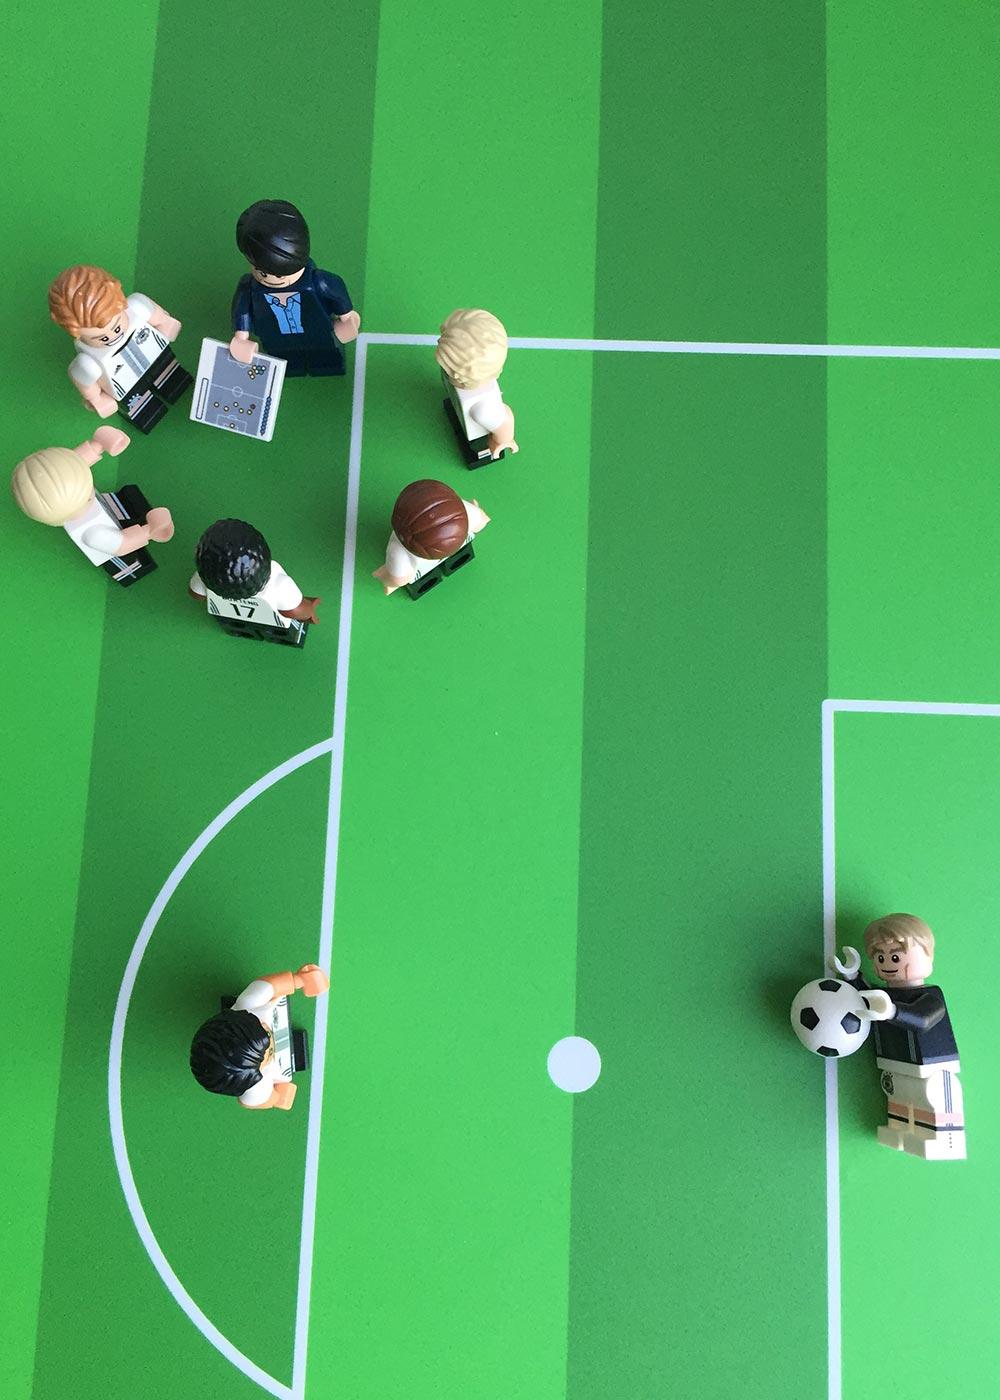 Ikea Dundra Spieltisch Fussballfeld gün Teilansicht Lego Männchen